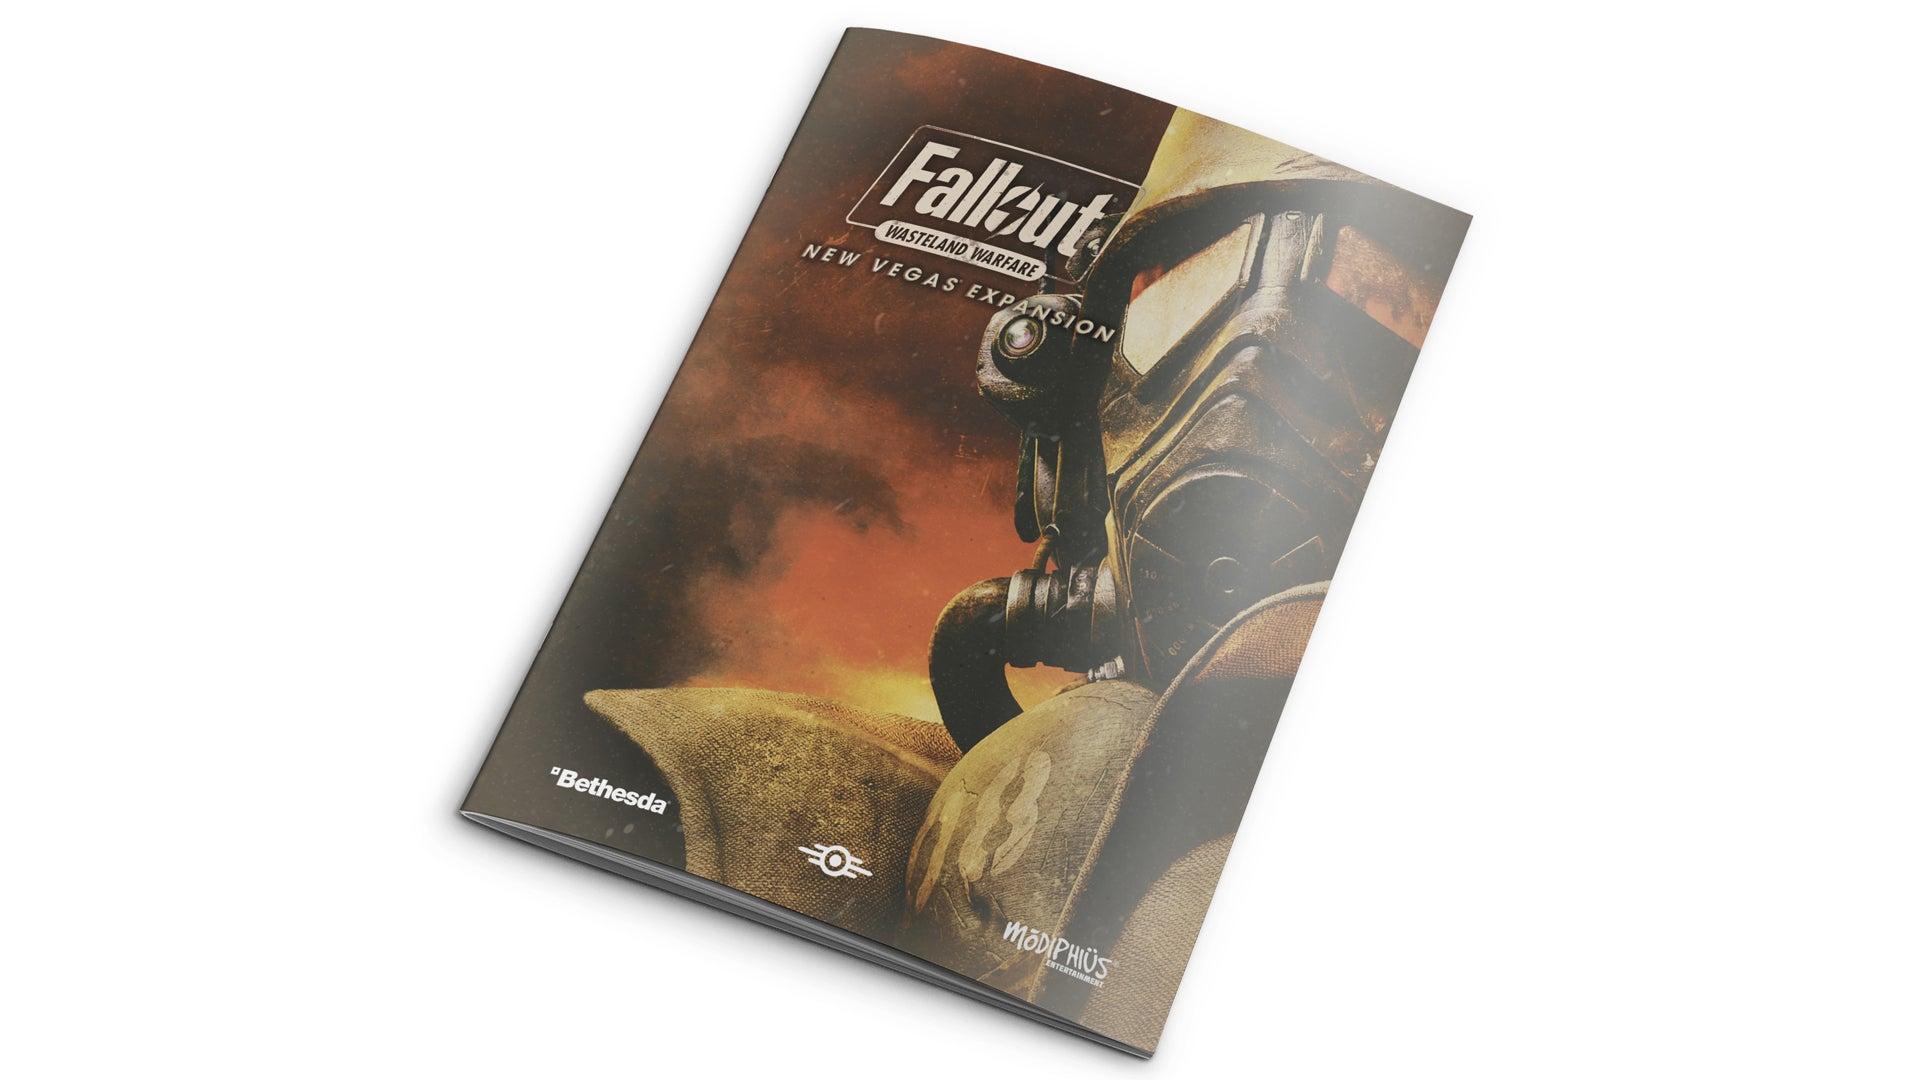 Fallout: Wasteland Warfare - New Vegas booklet